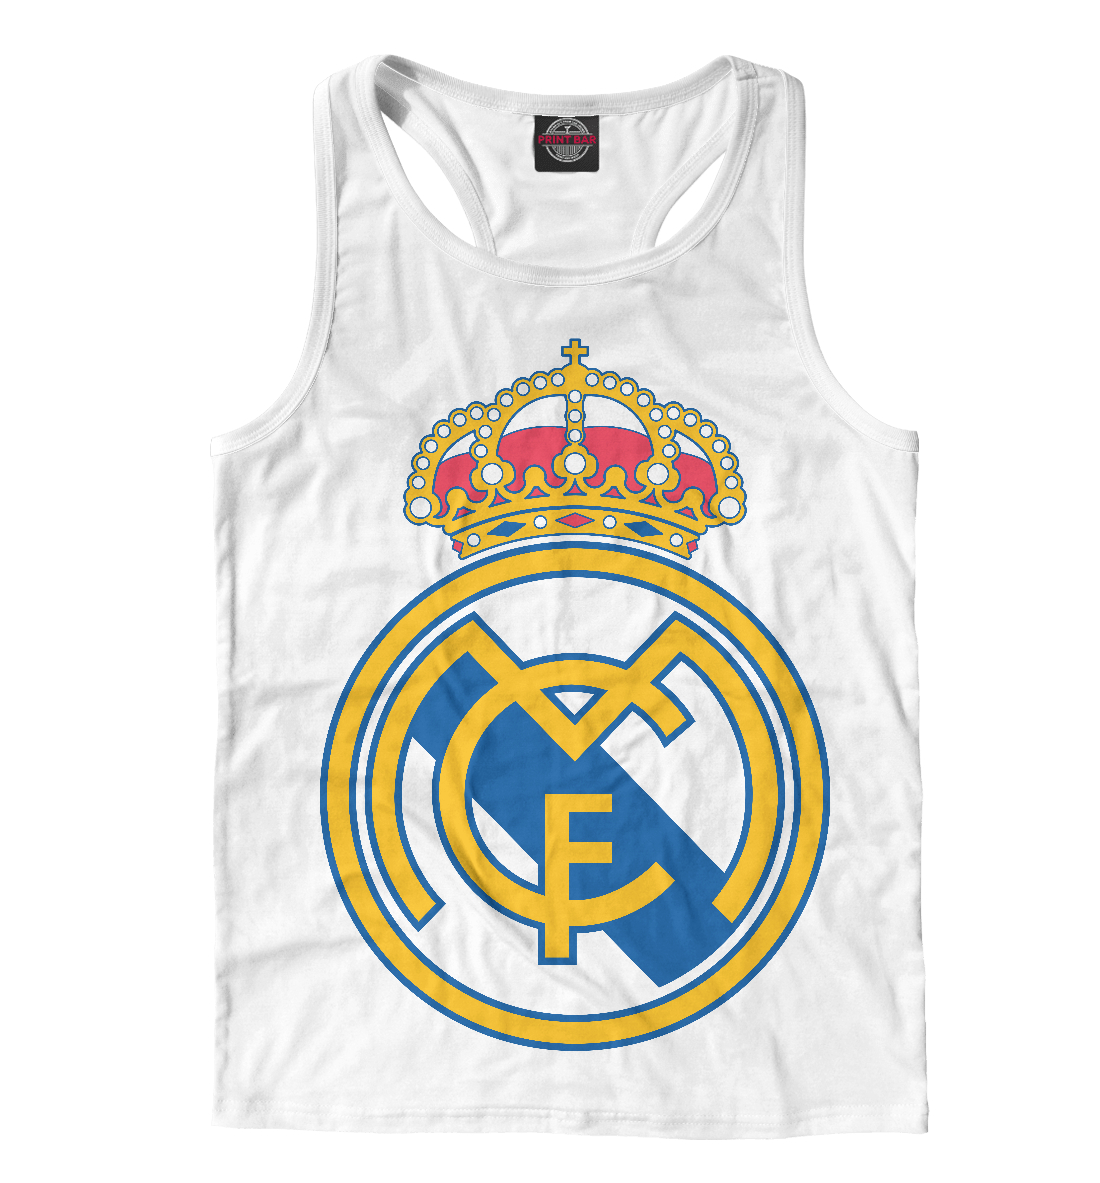 Реал Мадрид, Printbar, Майки борцовки, REA-630152-mayb-2  - купить со скидкой